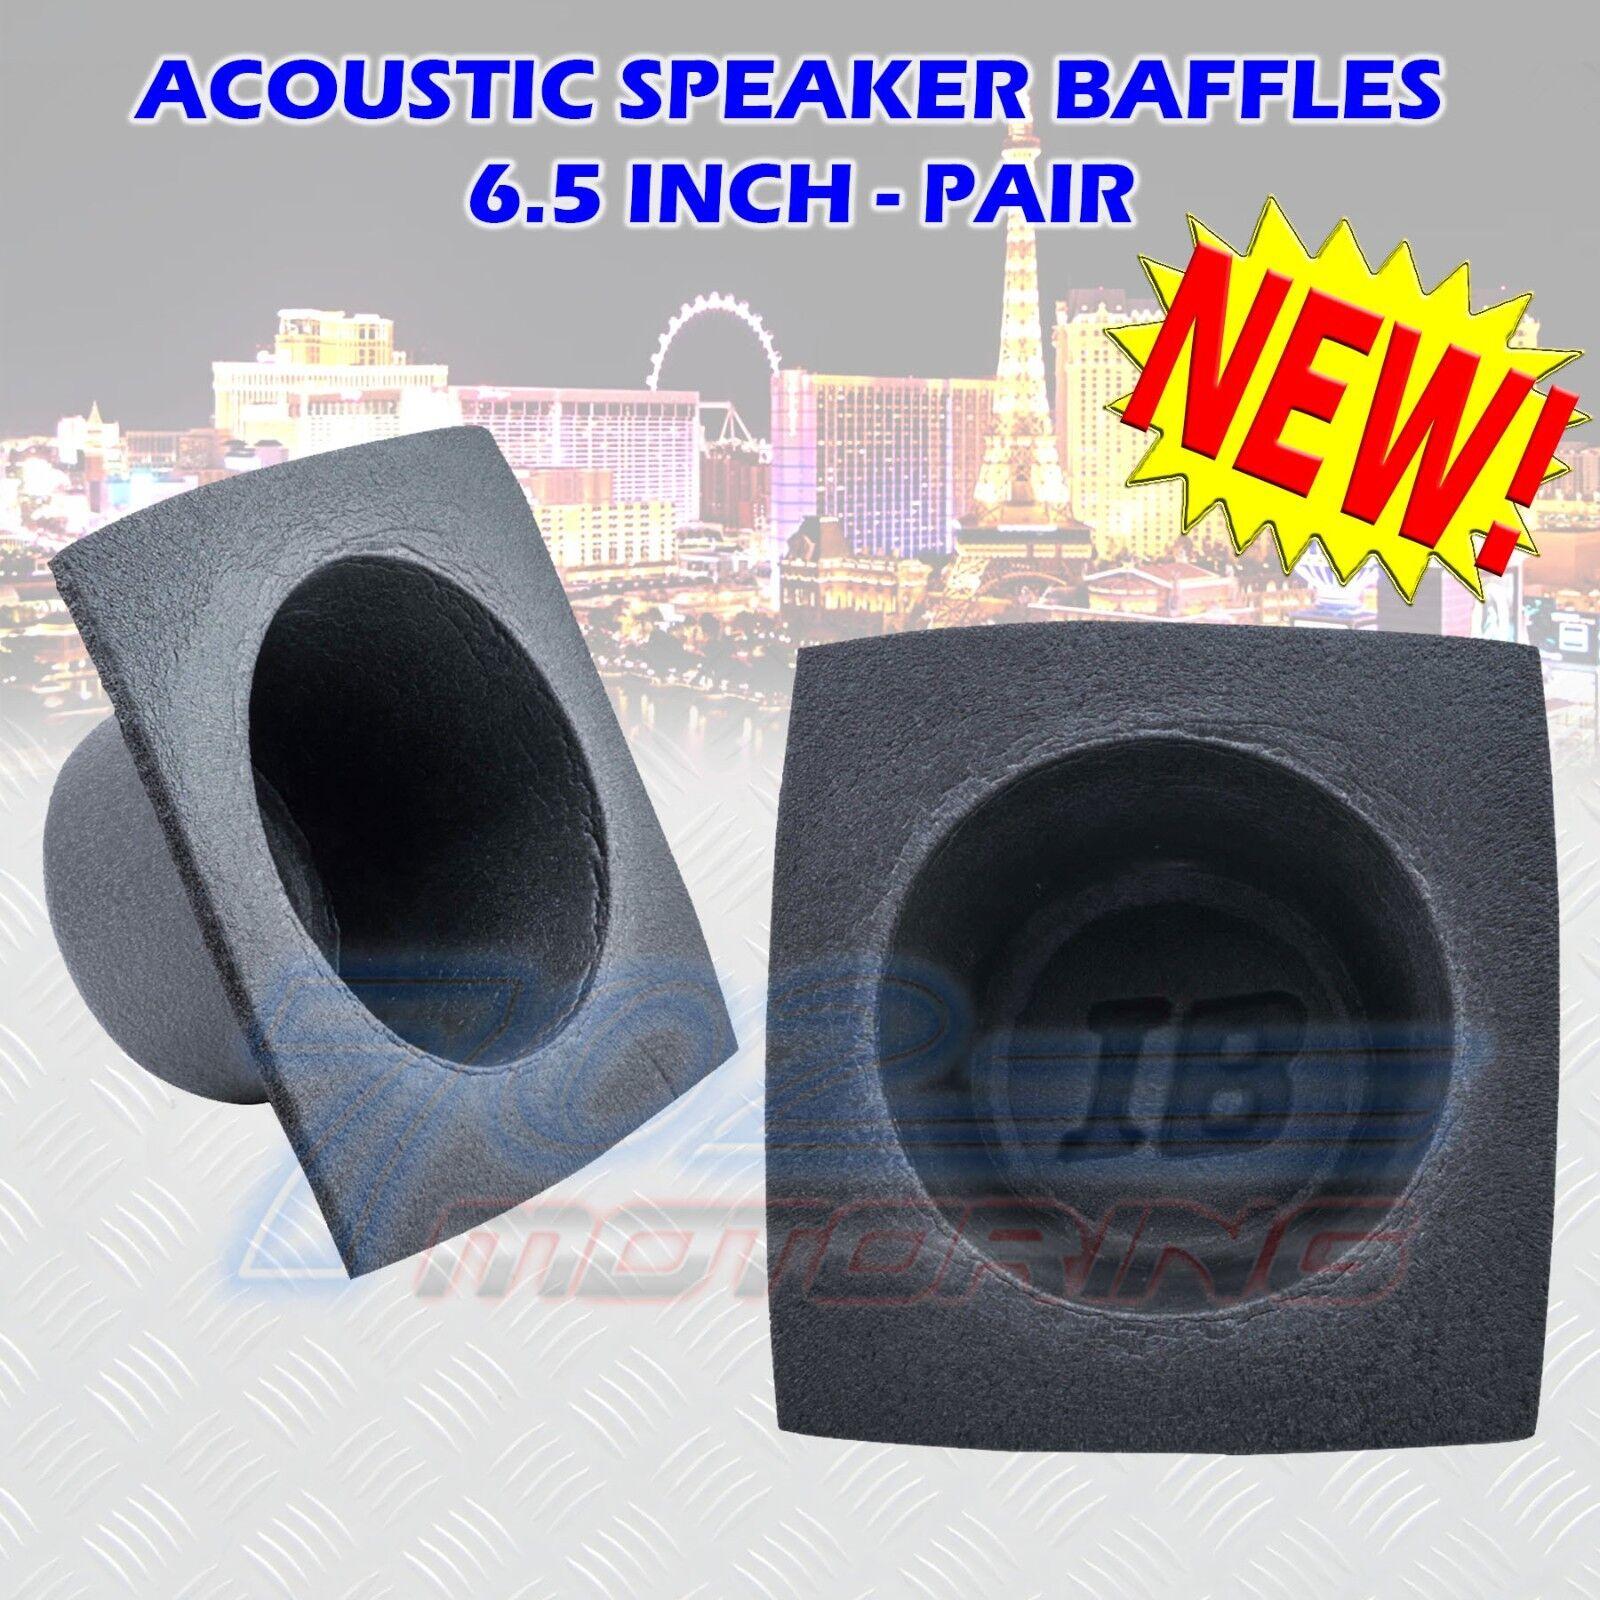 "6.5"" Acoustic Speaker Baffle Pair Baffles Bass Reflex Car A"